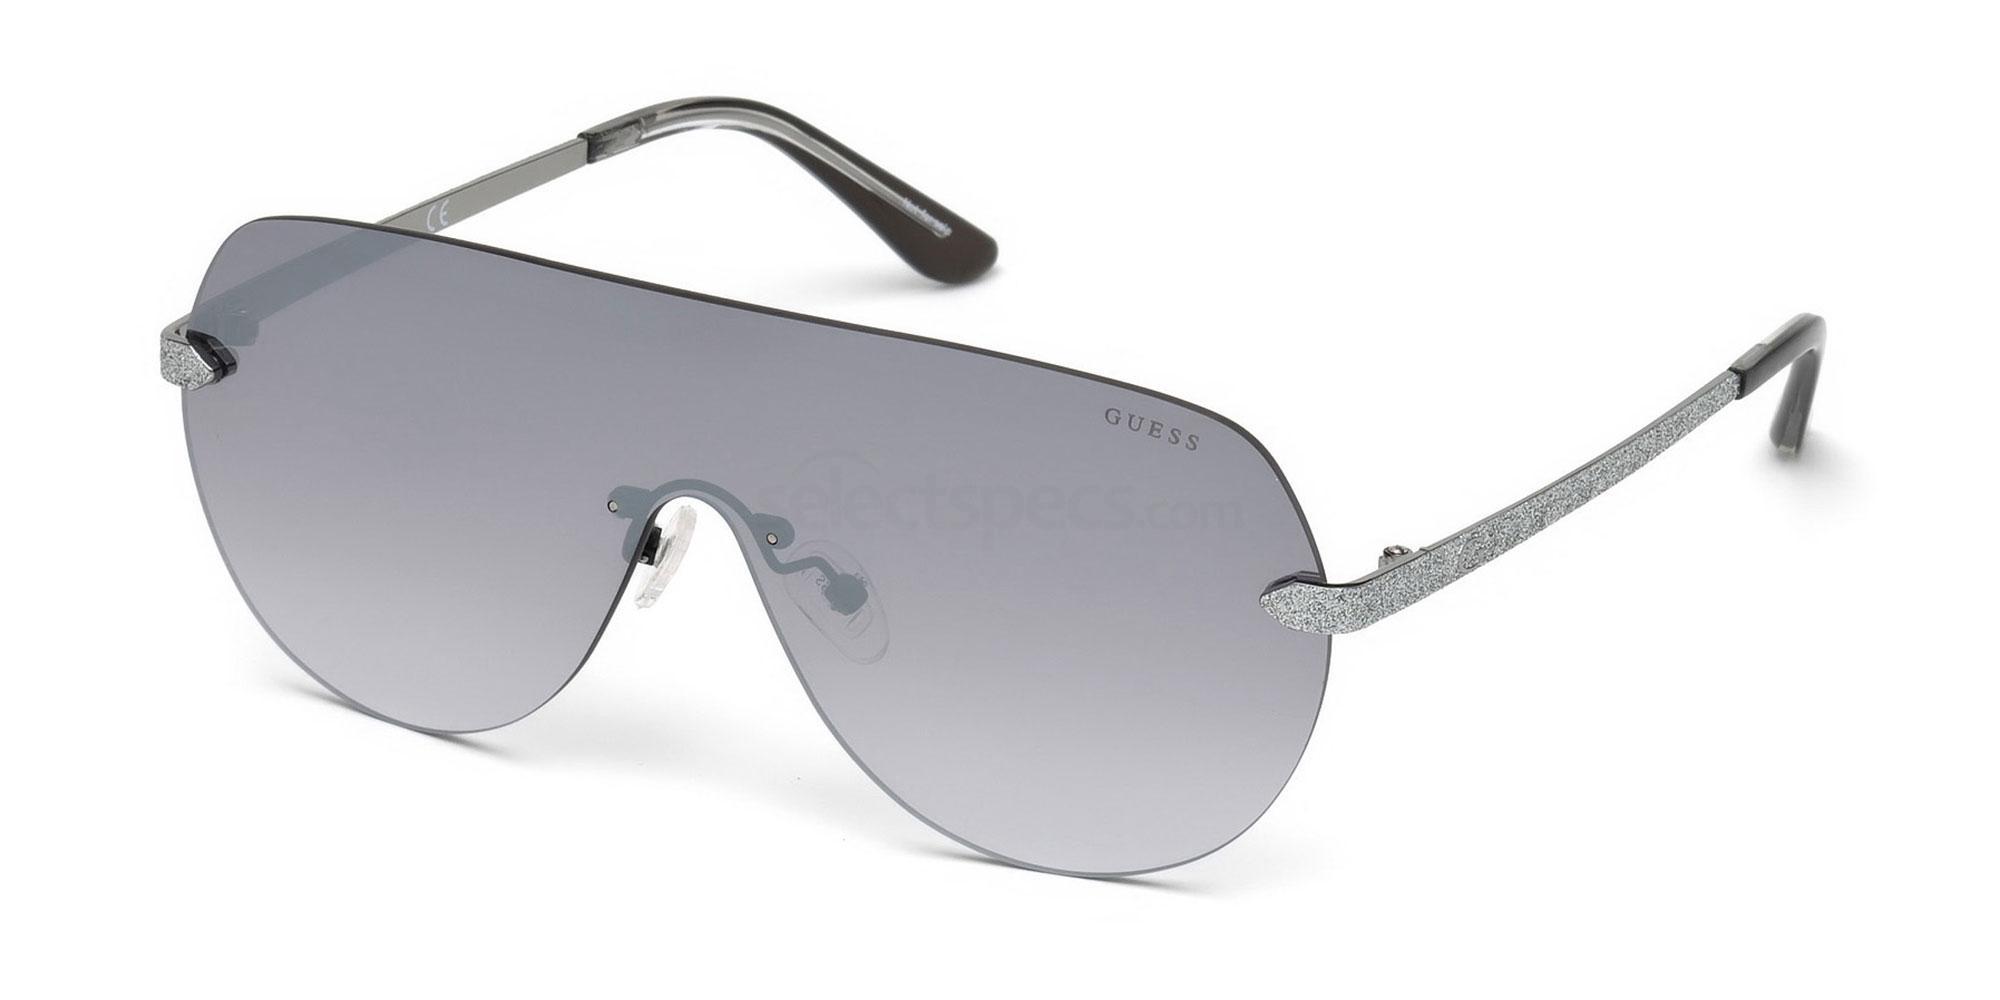 Adwoa Aboah sunglasses style Chanel campaign